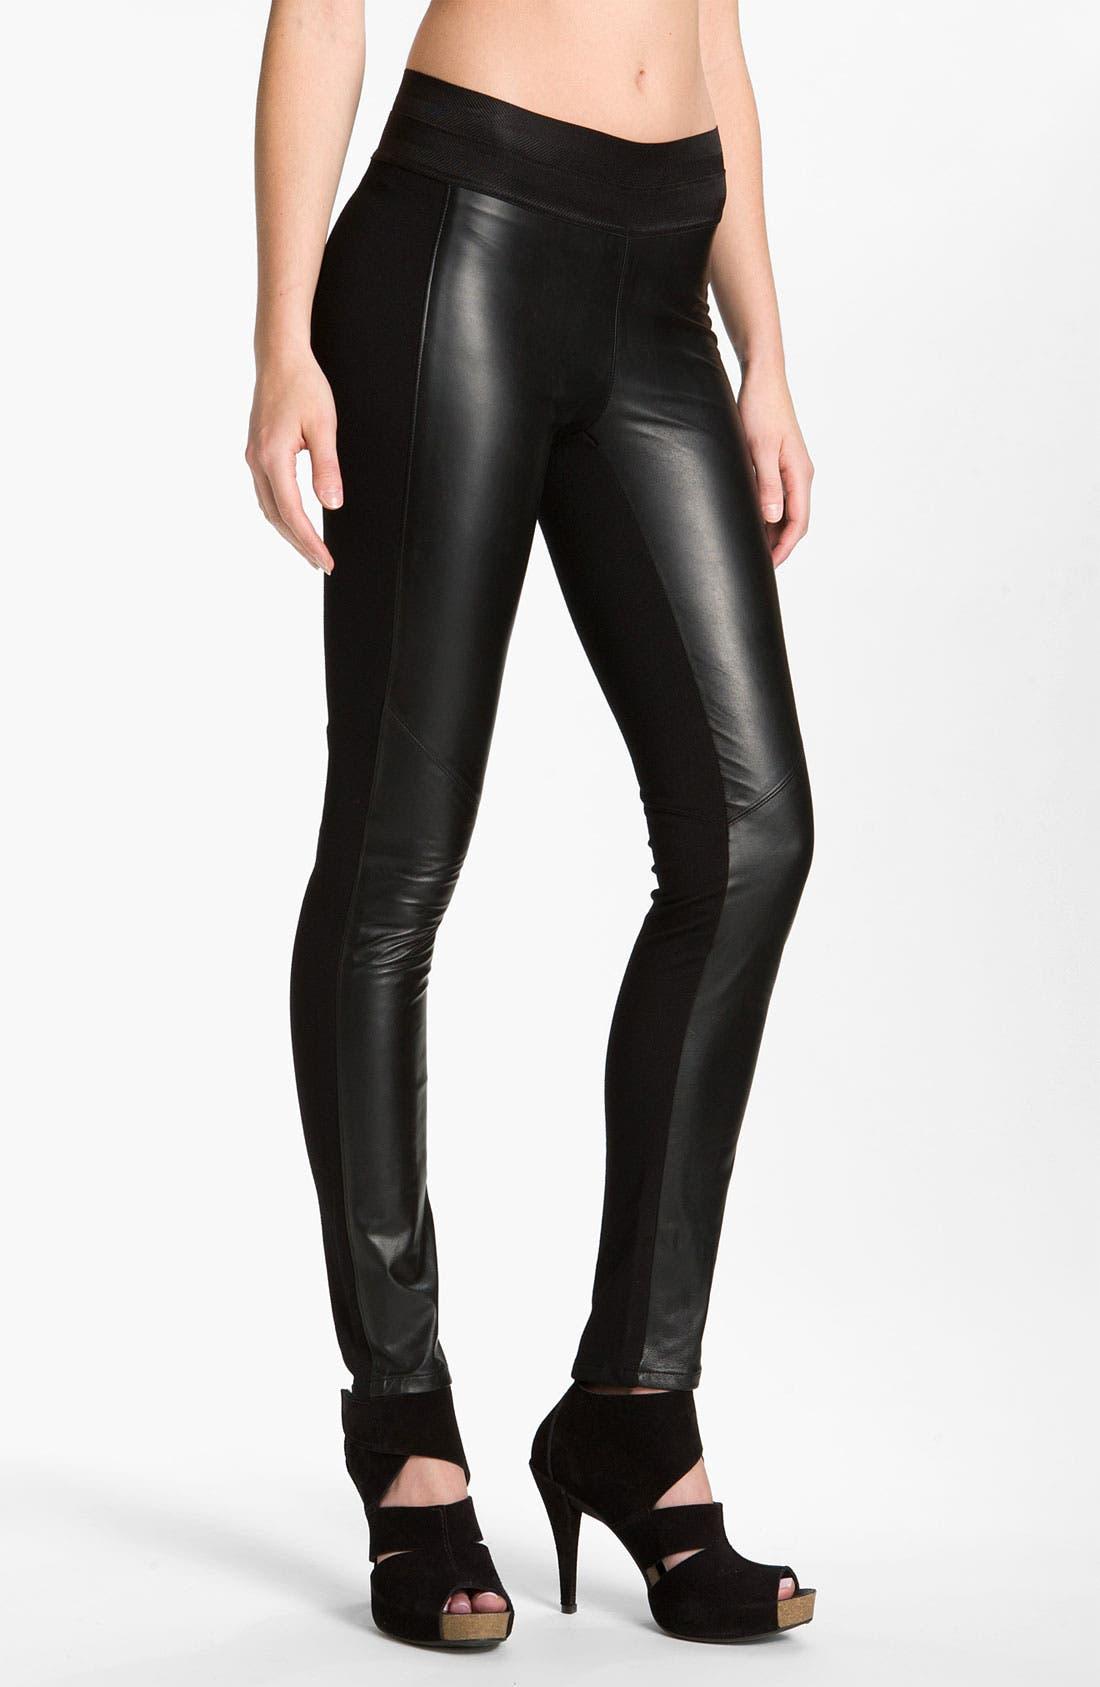 PAIGE BLACK LABEL,                             'Paloma' Leather Panel Leggings,                             Main thumbnail 1, color,                             001